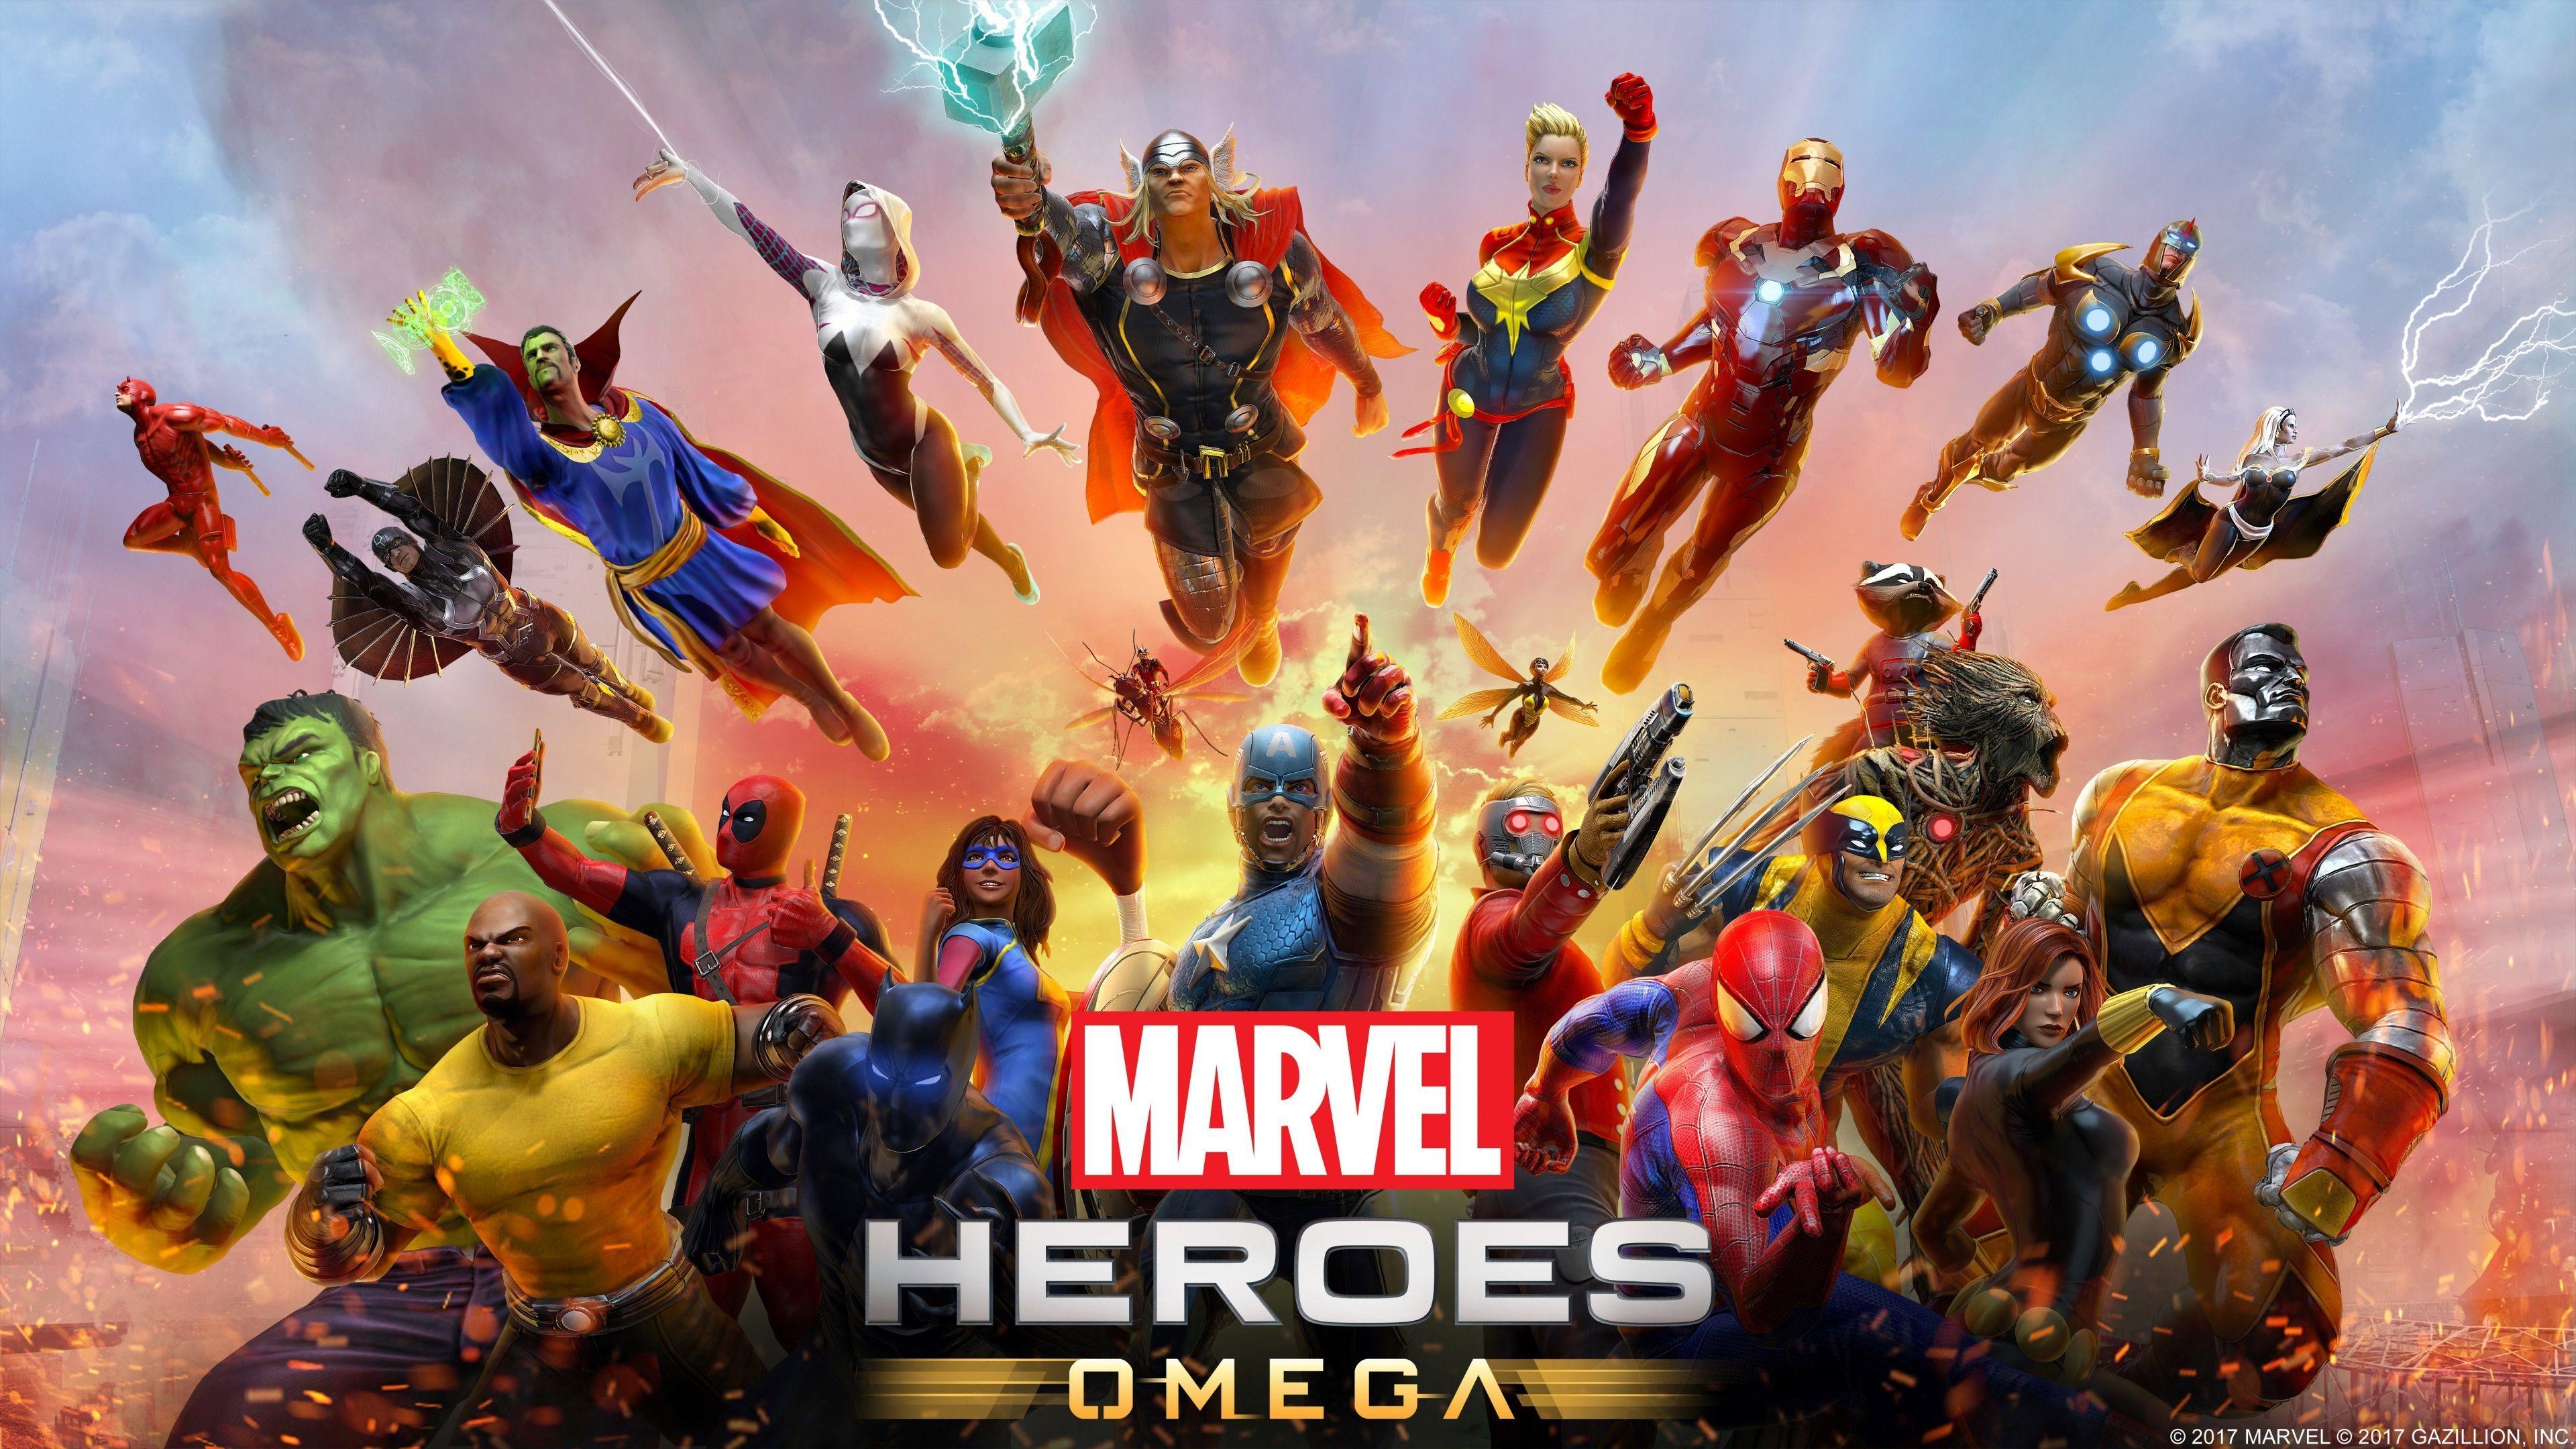 Marvel heroes omega clipart freeuse library Download Marvel Heroes Omega 4k Wallpaper Hd Puter Desktop - Marvel ... freeuse library